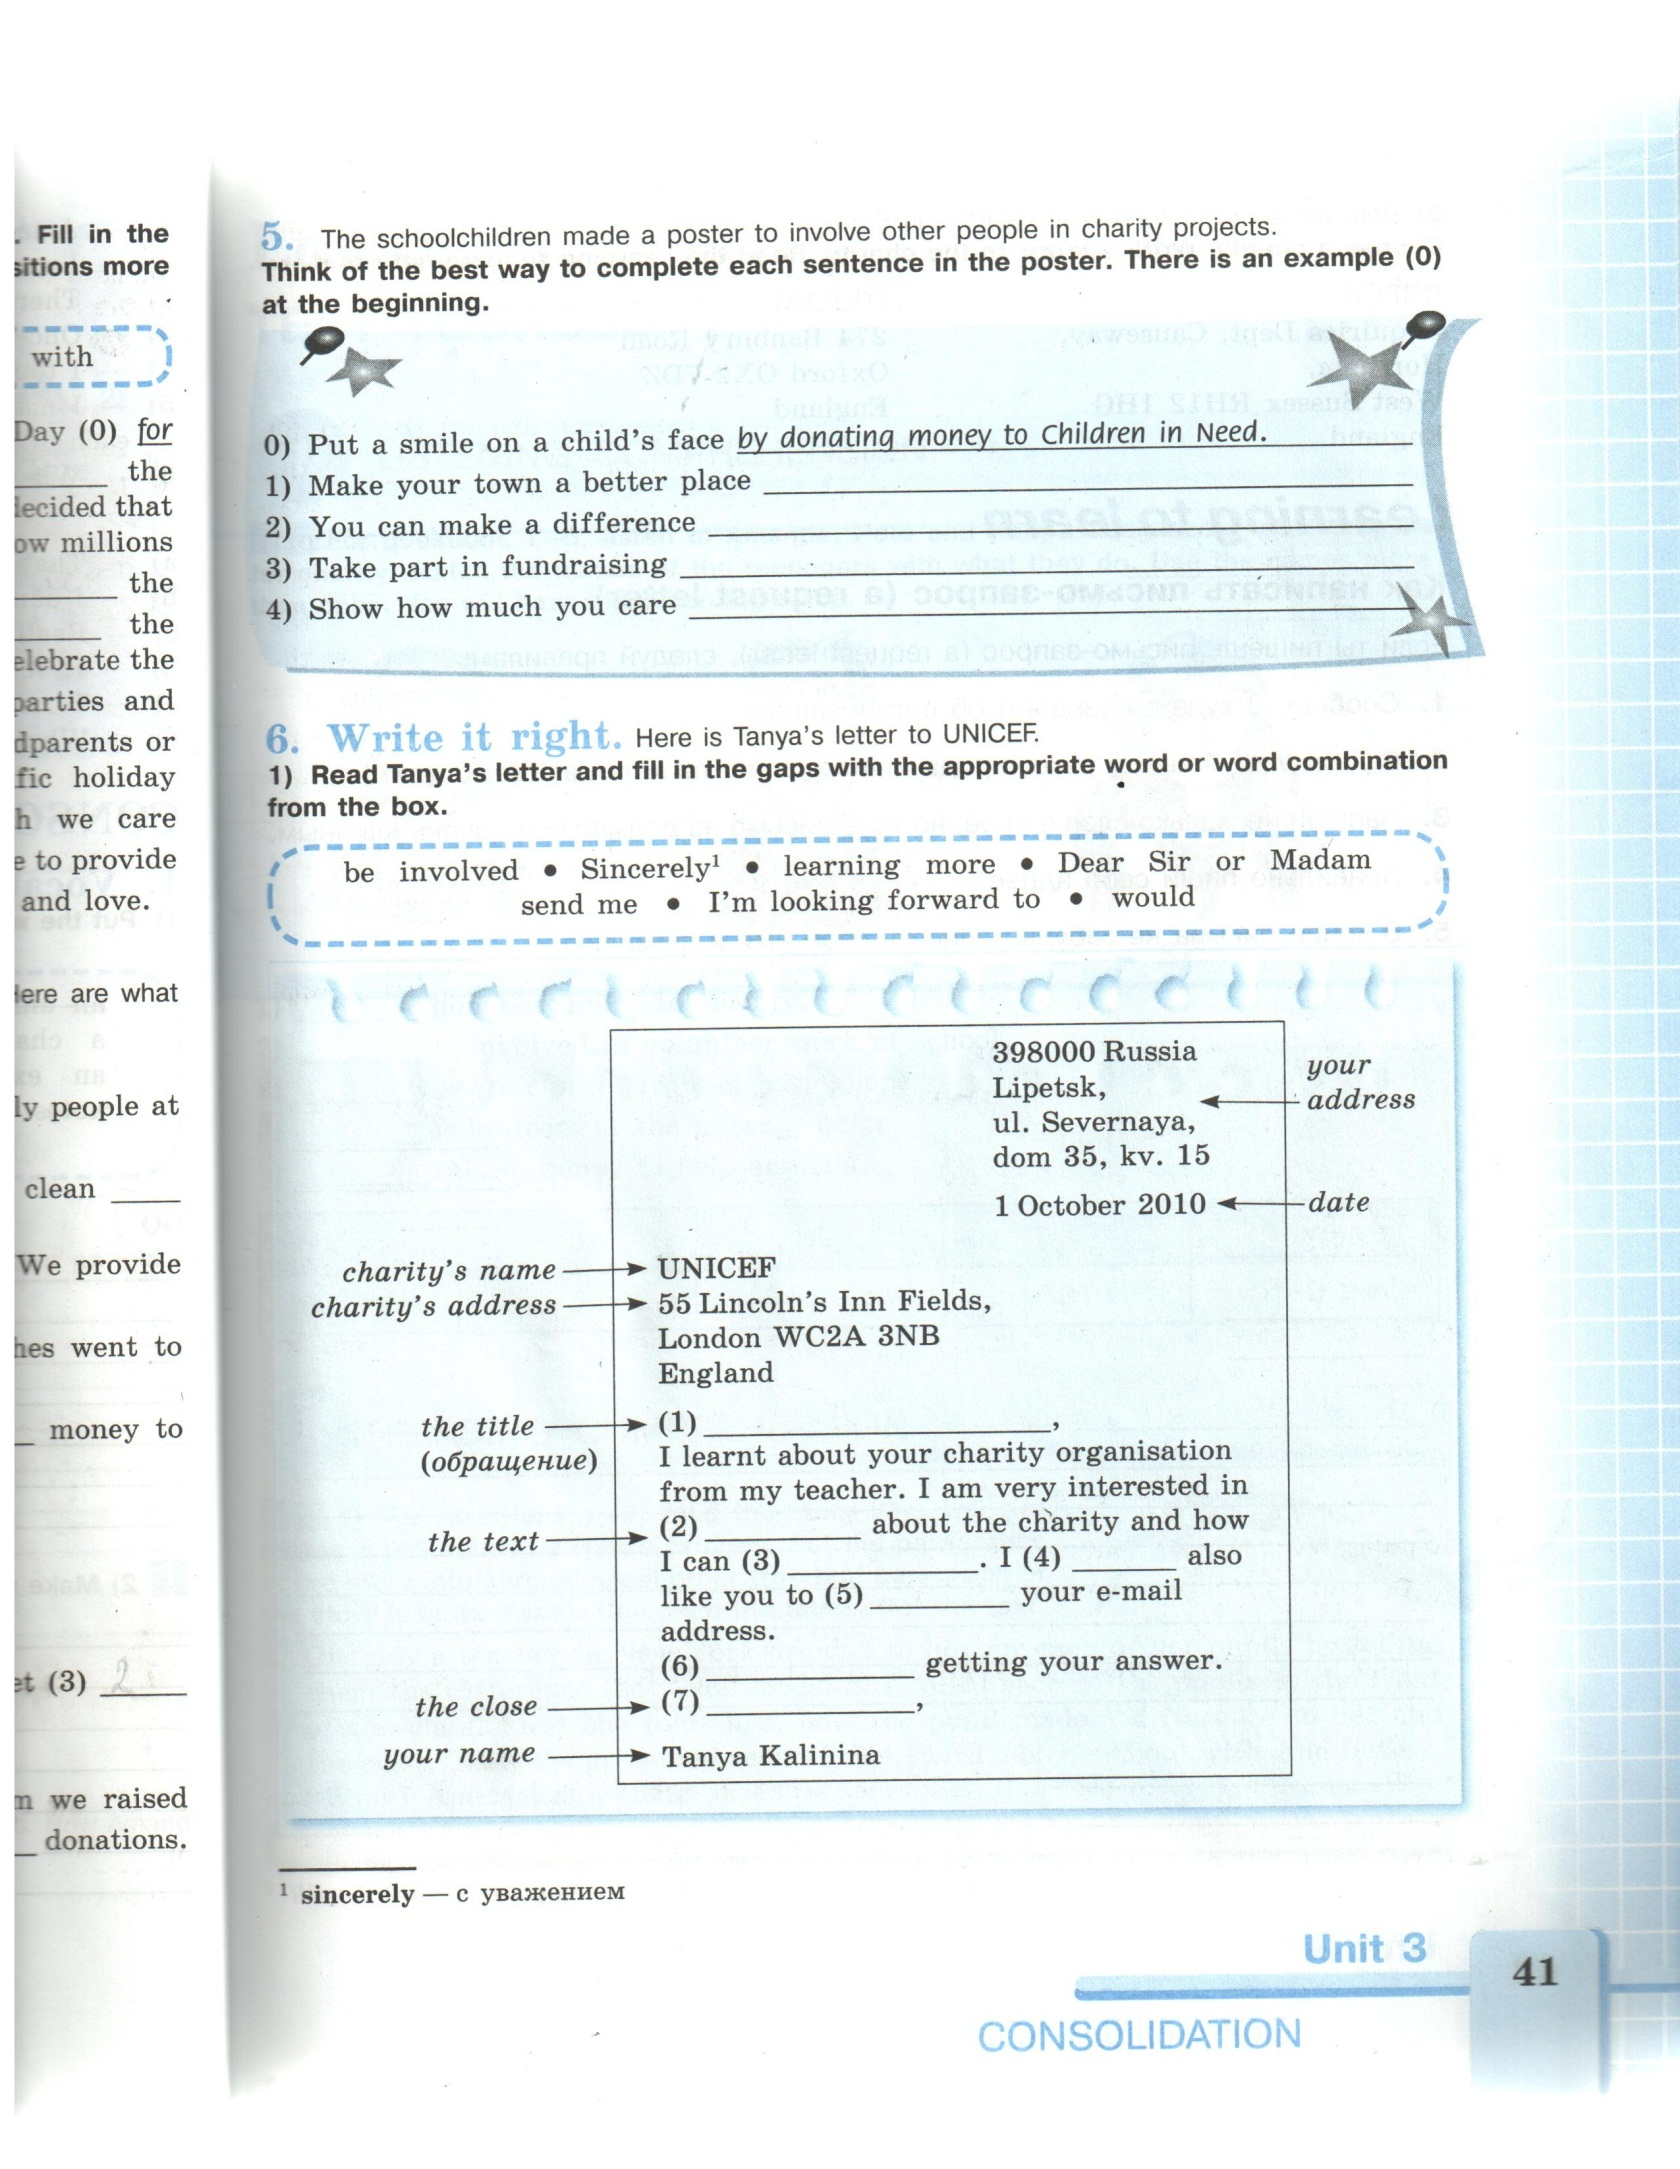 C:\Users\Грузиновская СОШ\Documents\Scanned Documents\Рисунок (1956).jpg